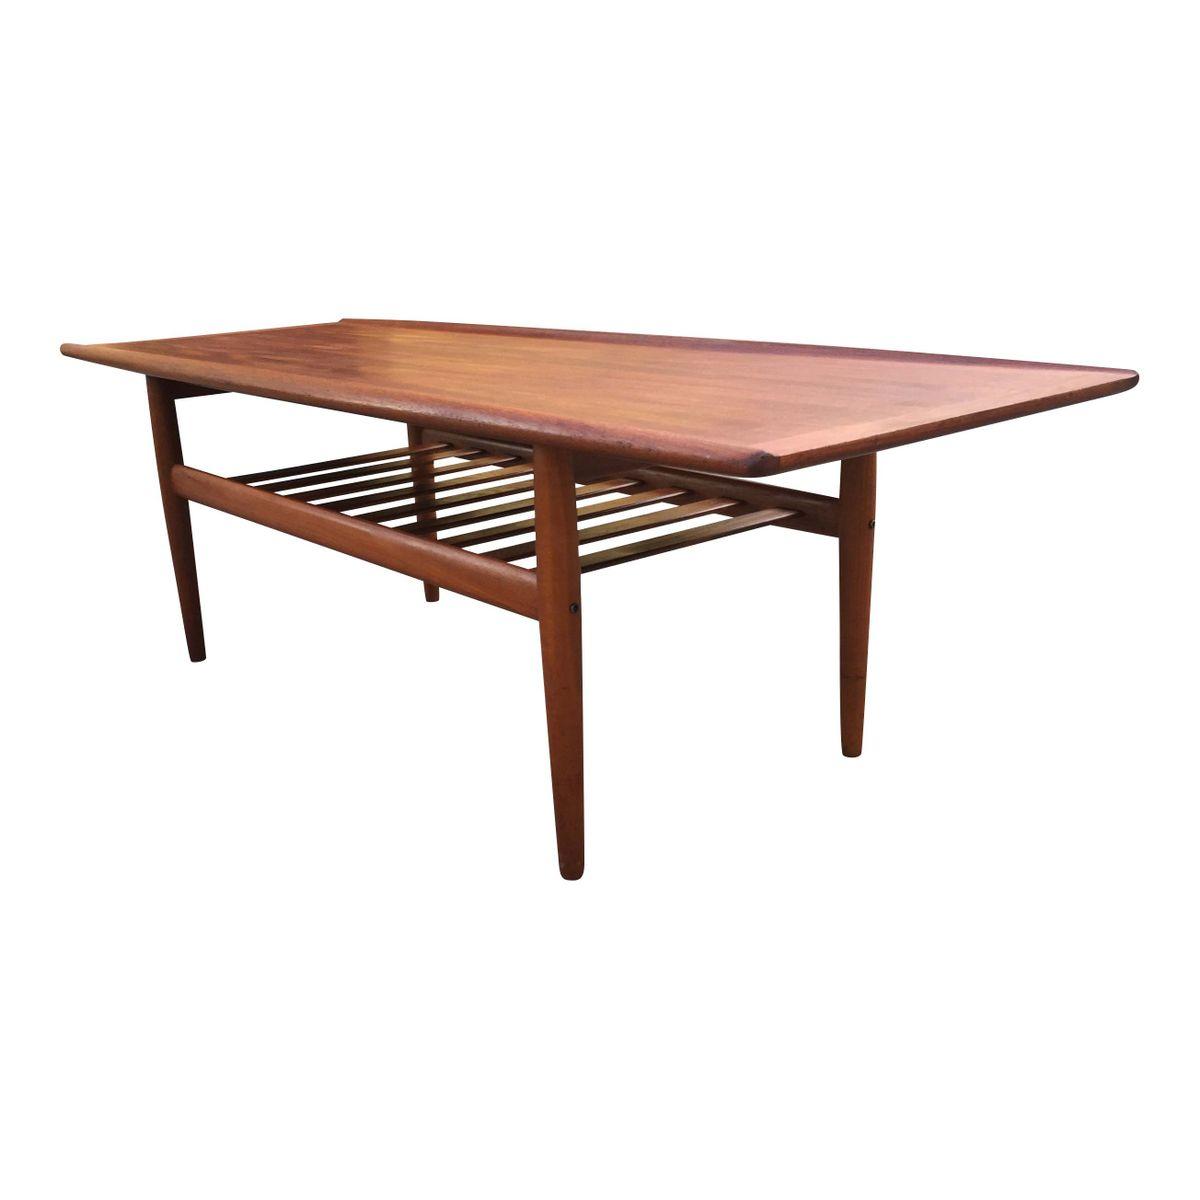 Long Coffee Table By Grete Jalk For Glostrup M Belfabrik